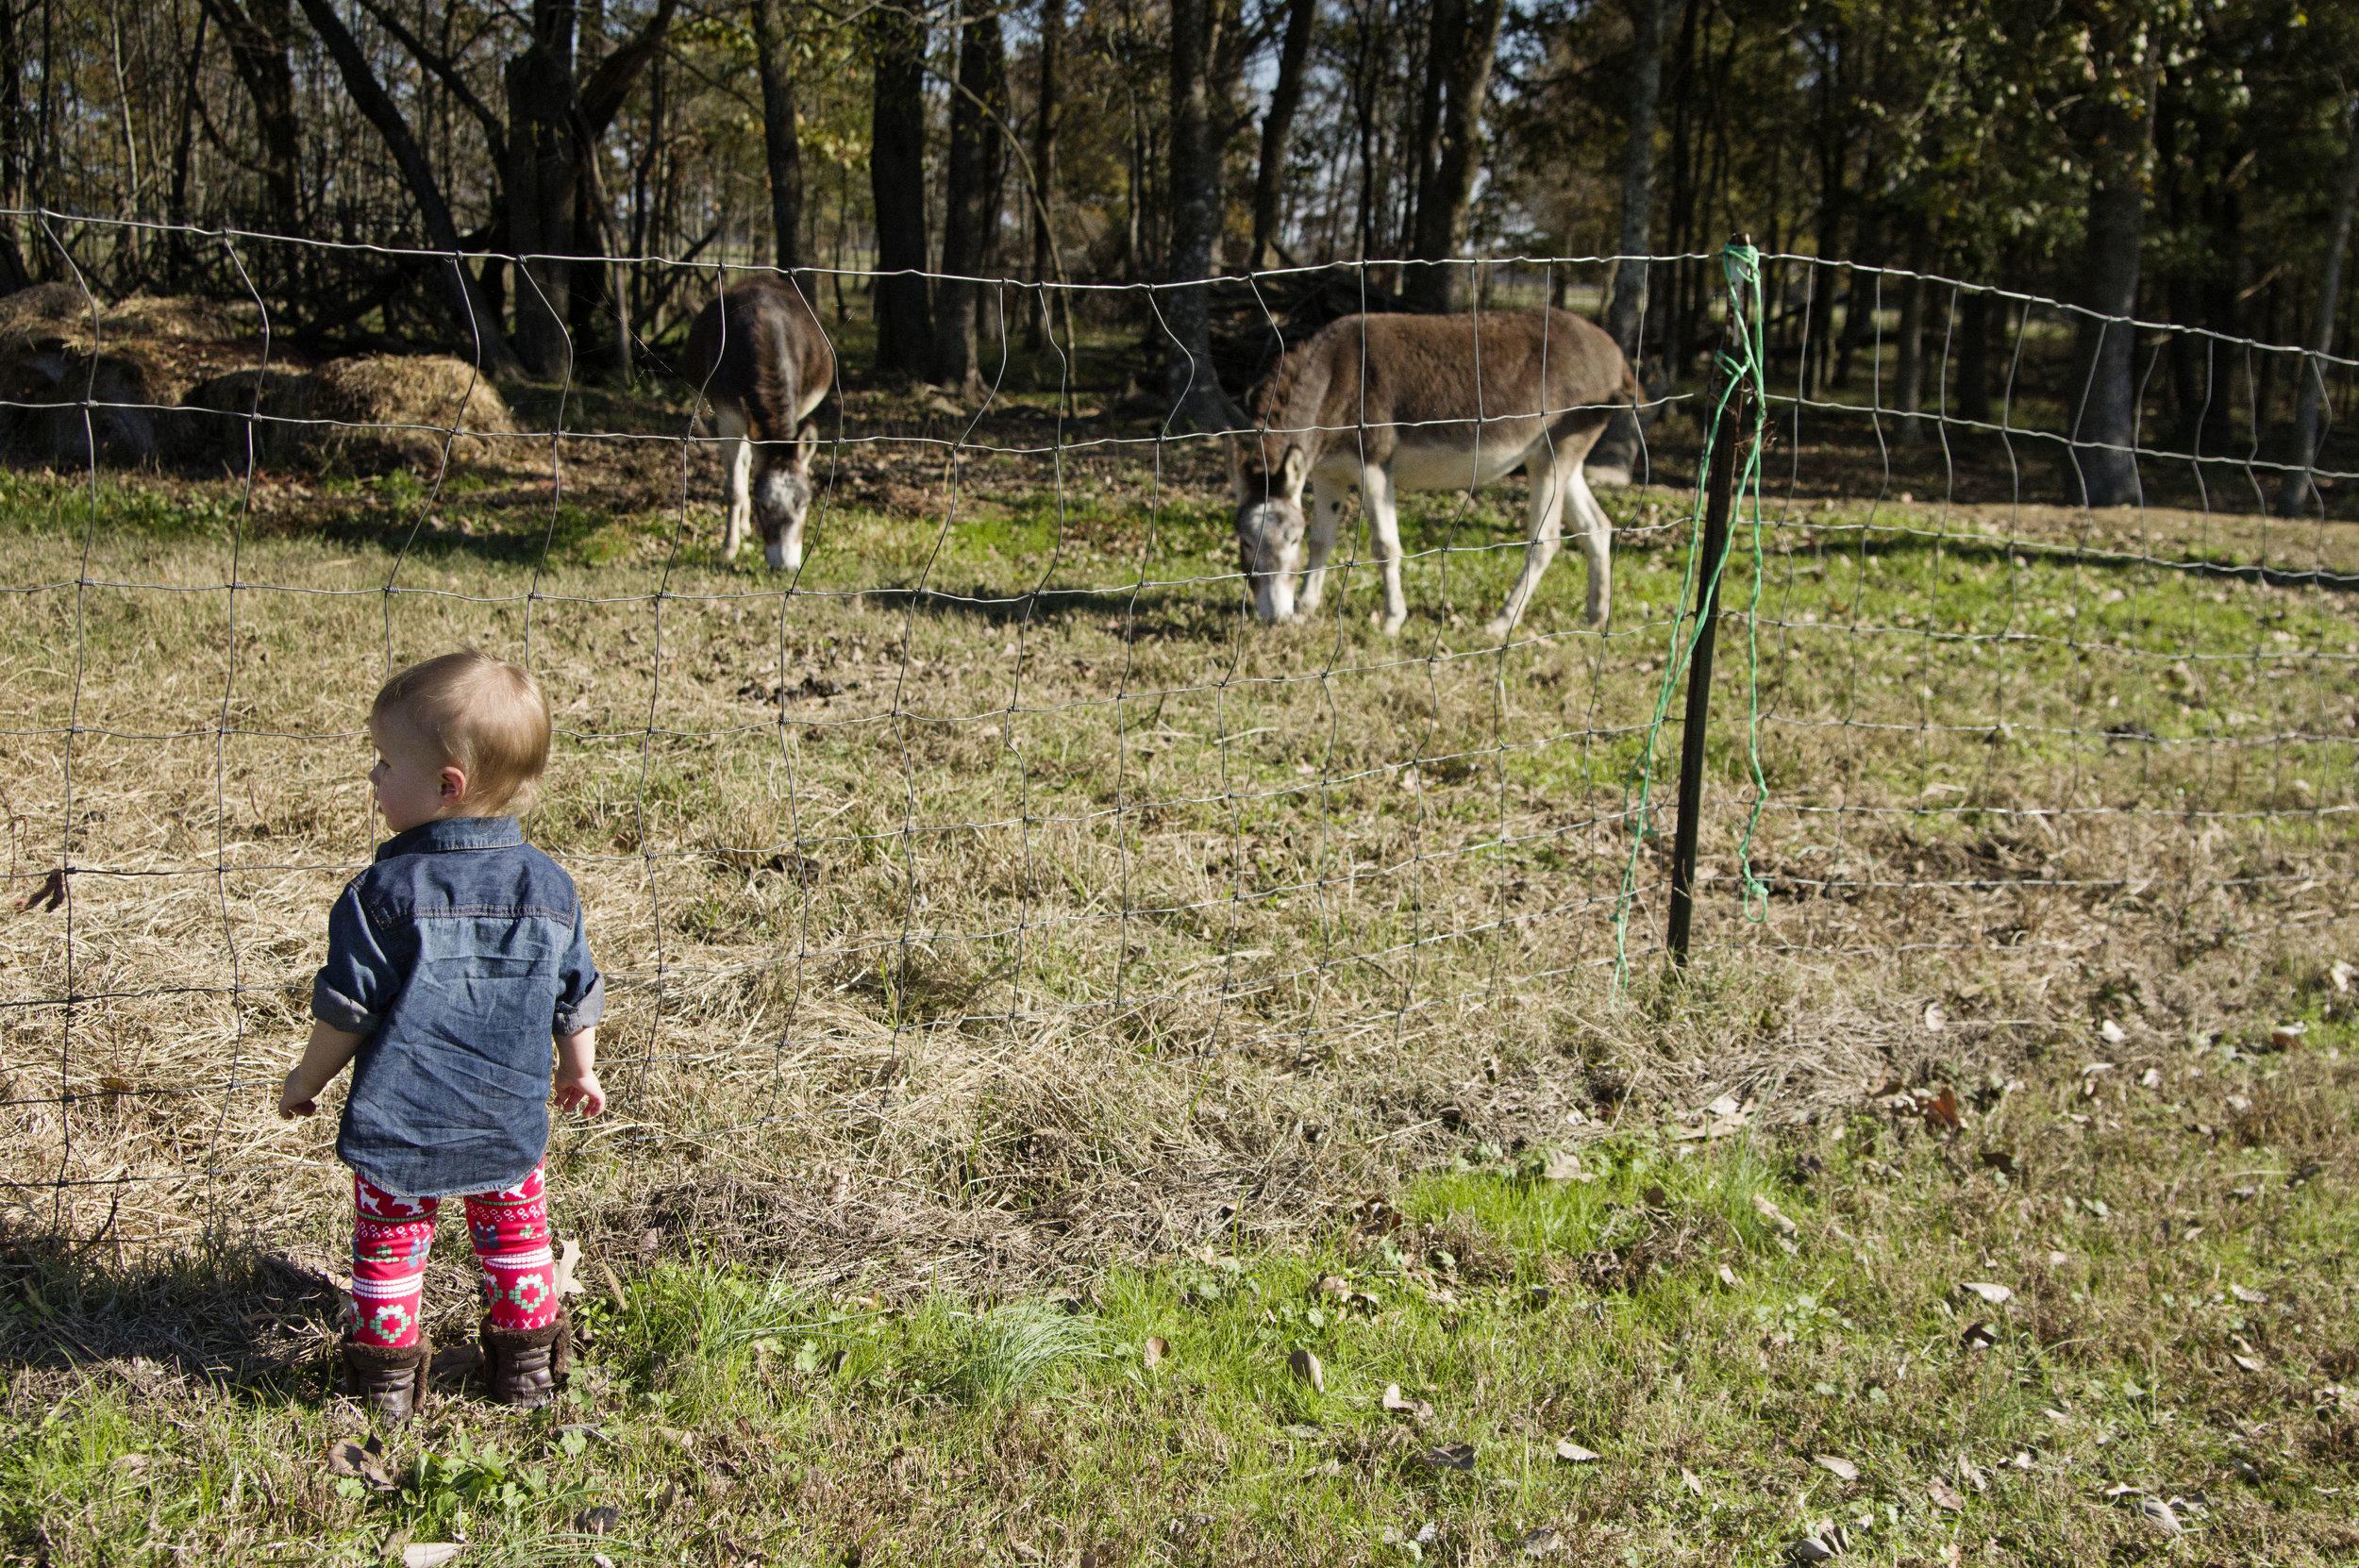 curry_farms_donkeys_2015.jpg